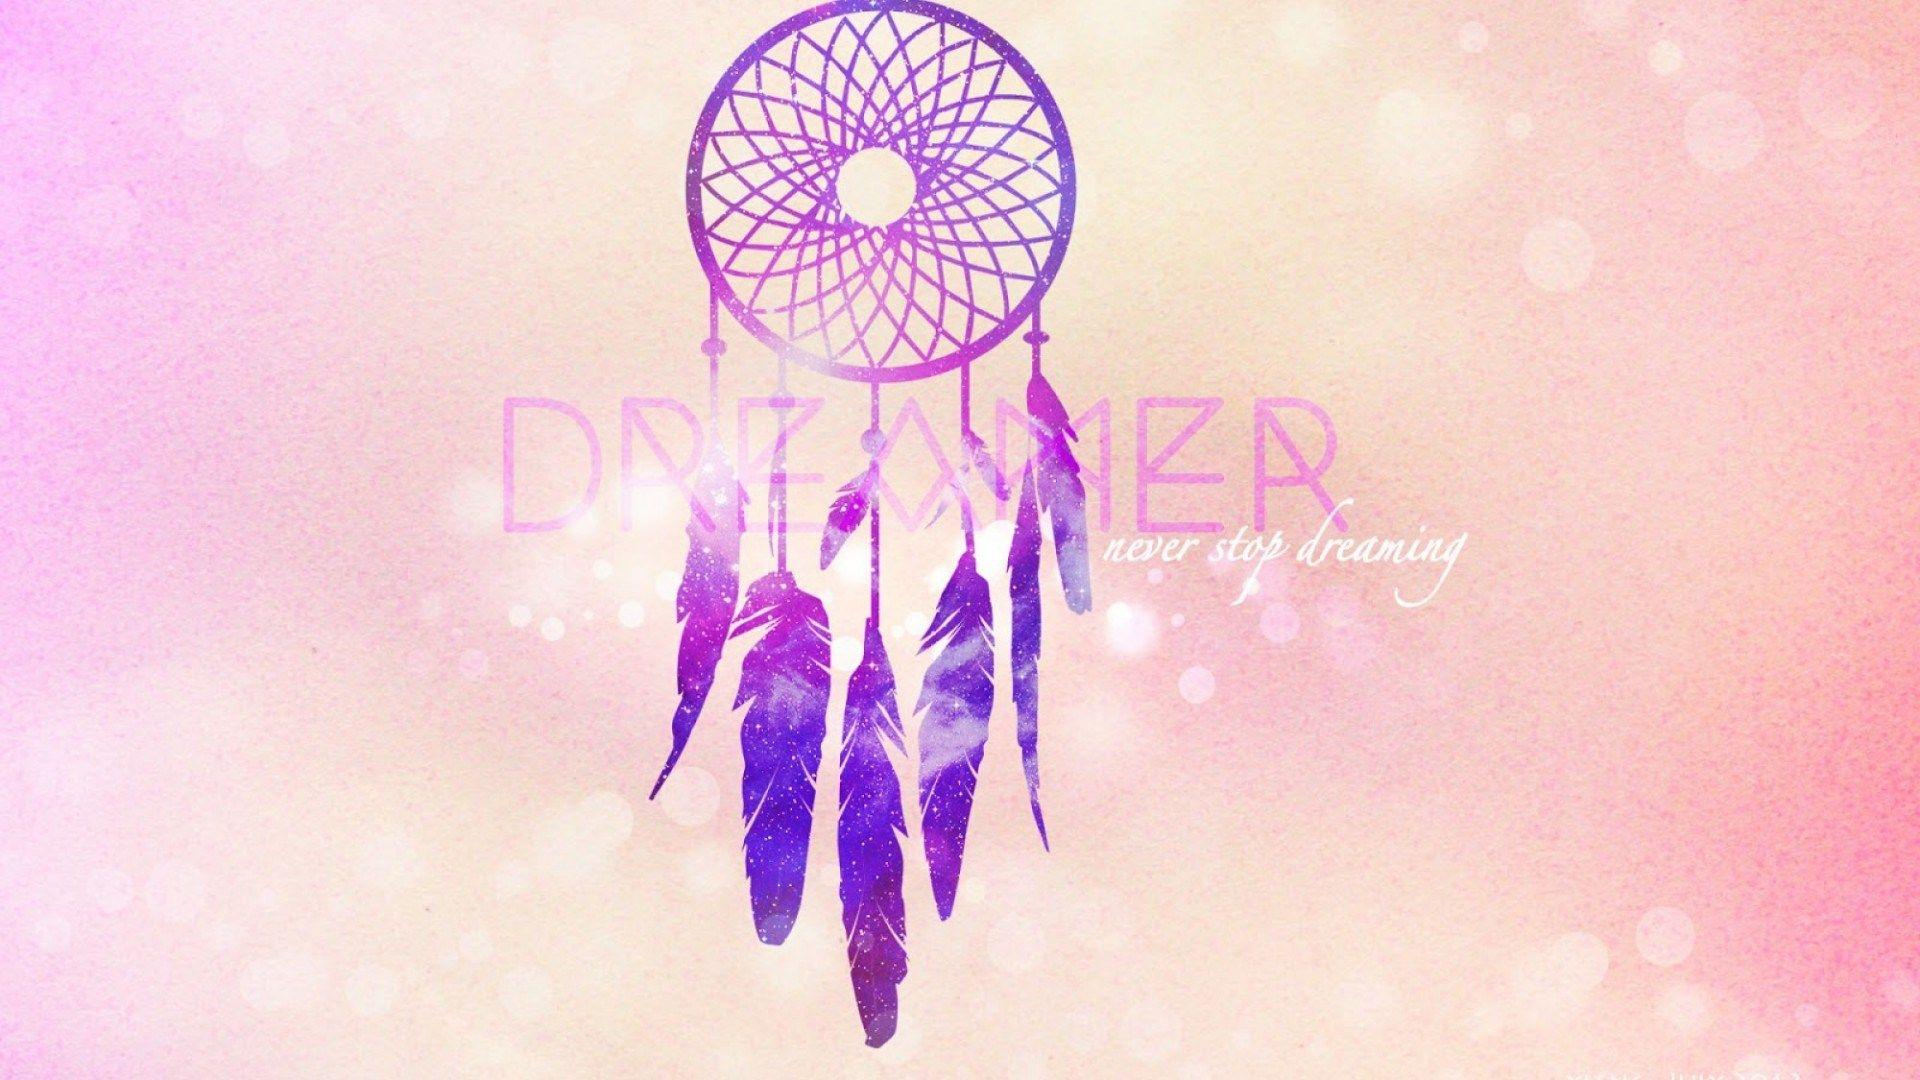 dreamcatcher 1080p